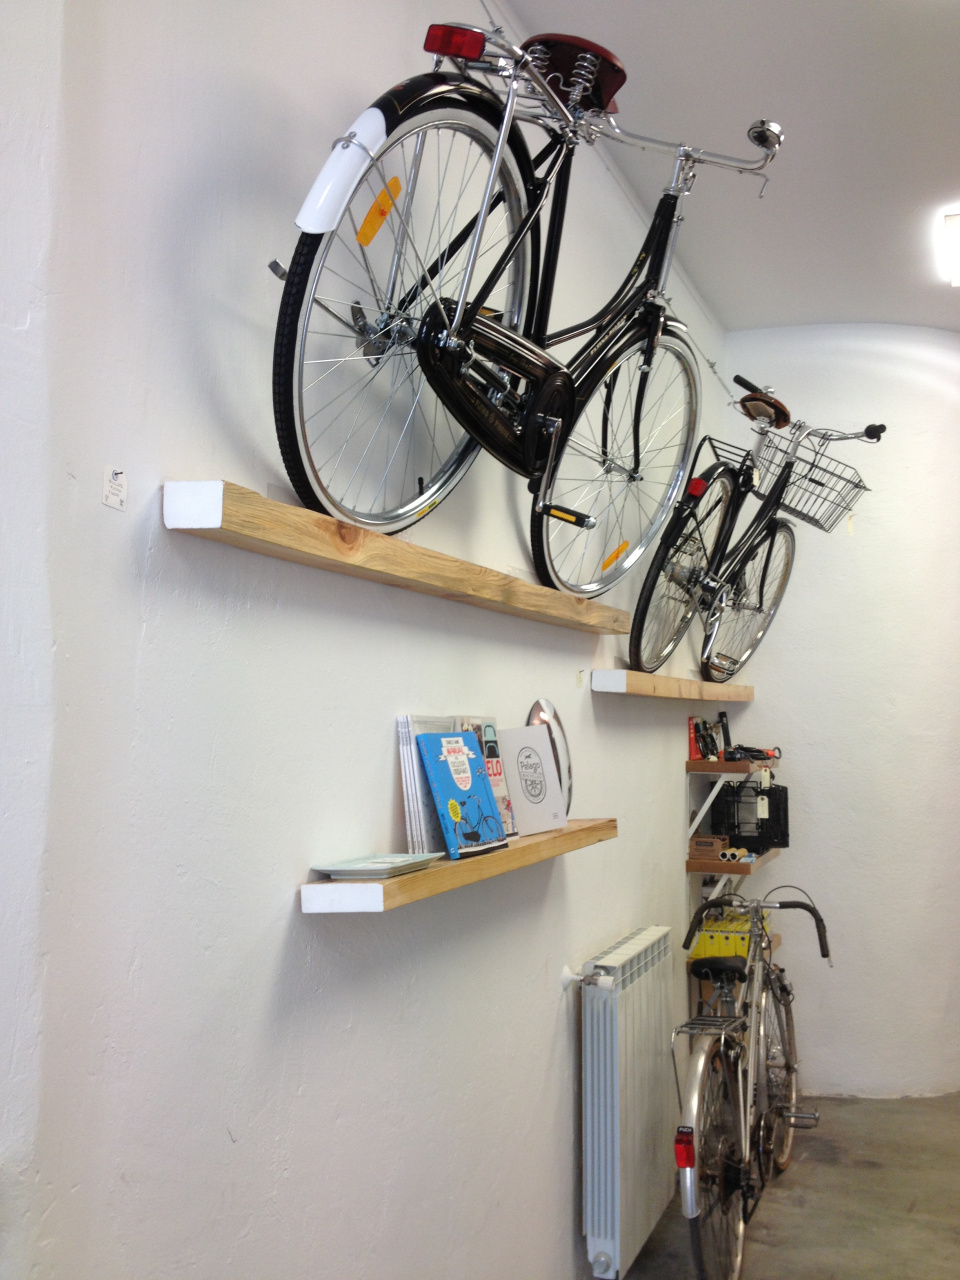 La guarida de bam c mo guardar la bici - Como alicatar una pared ...